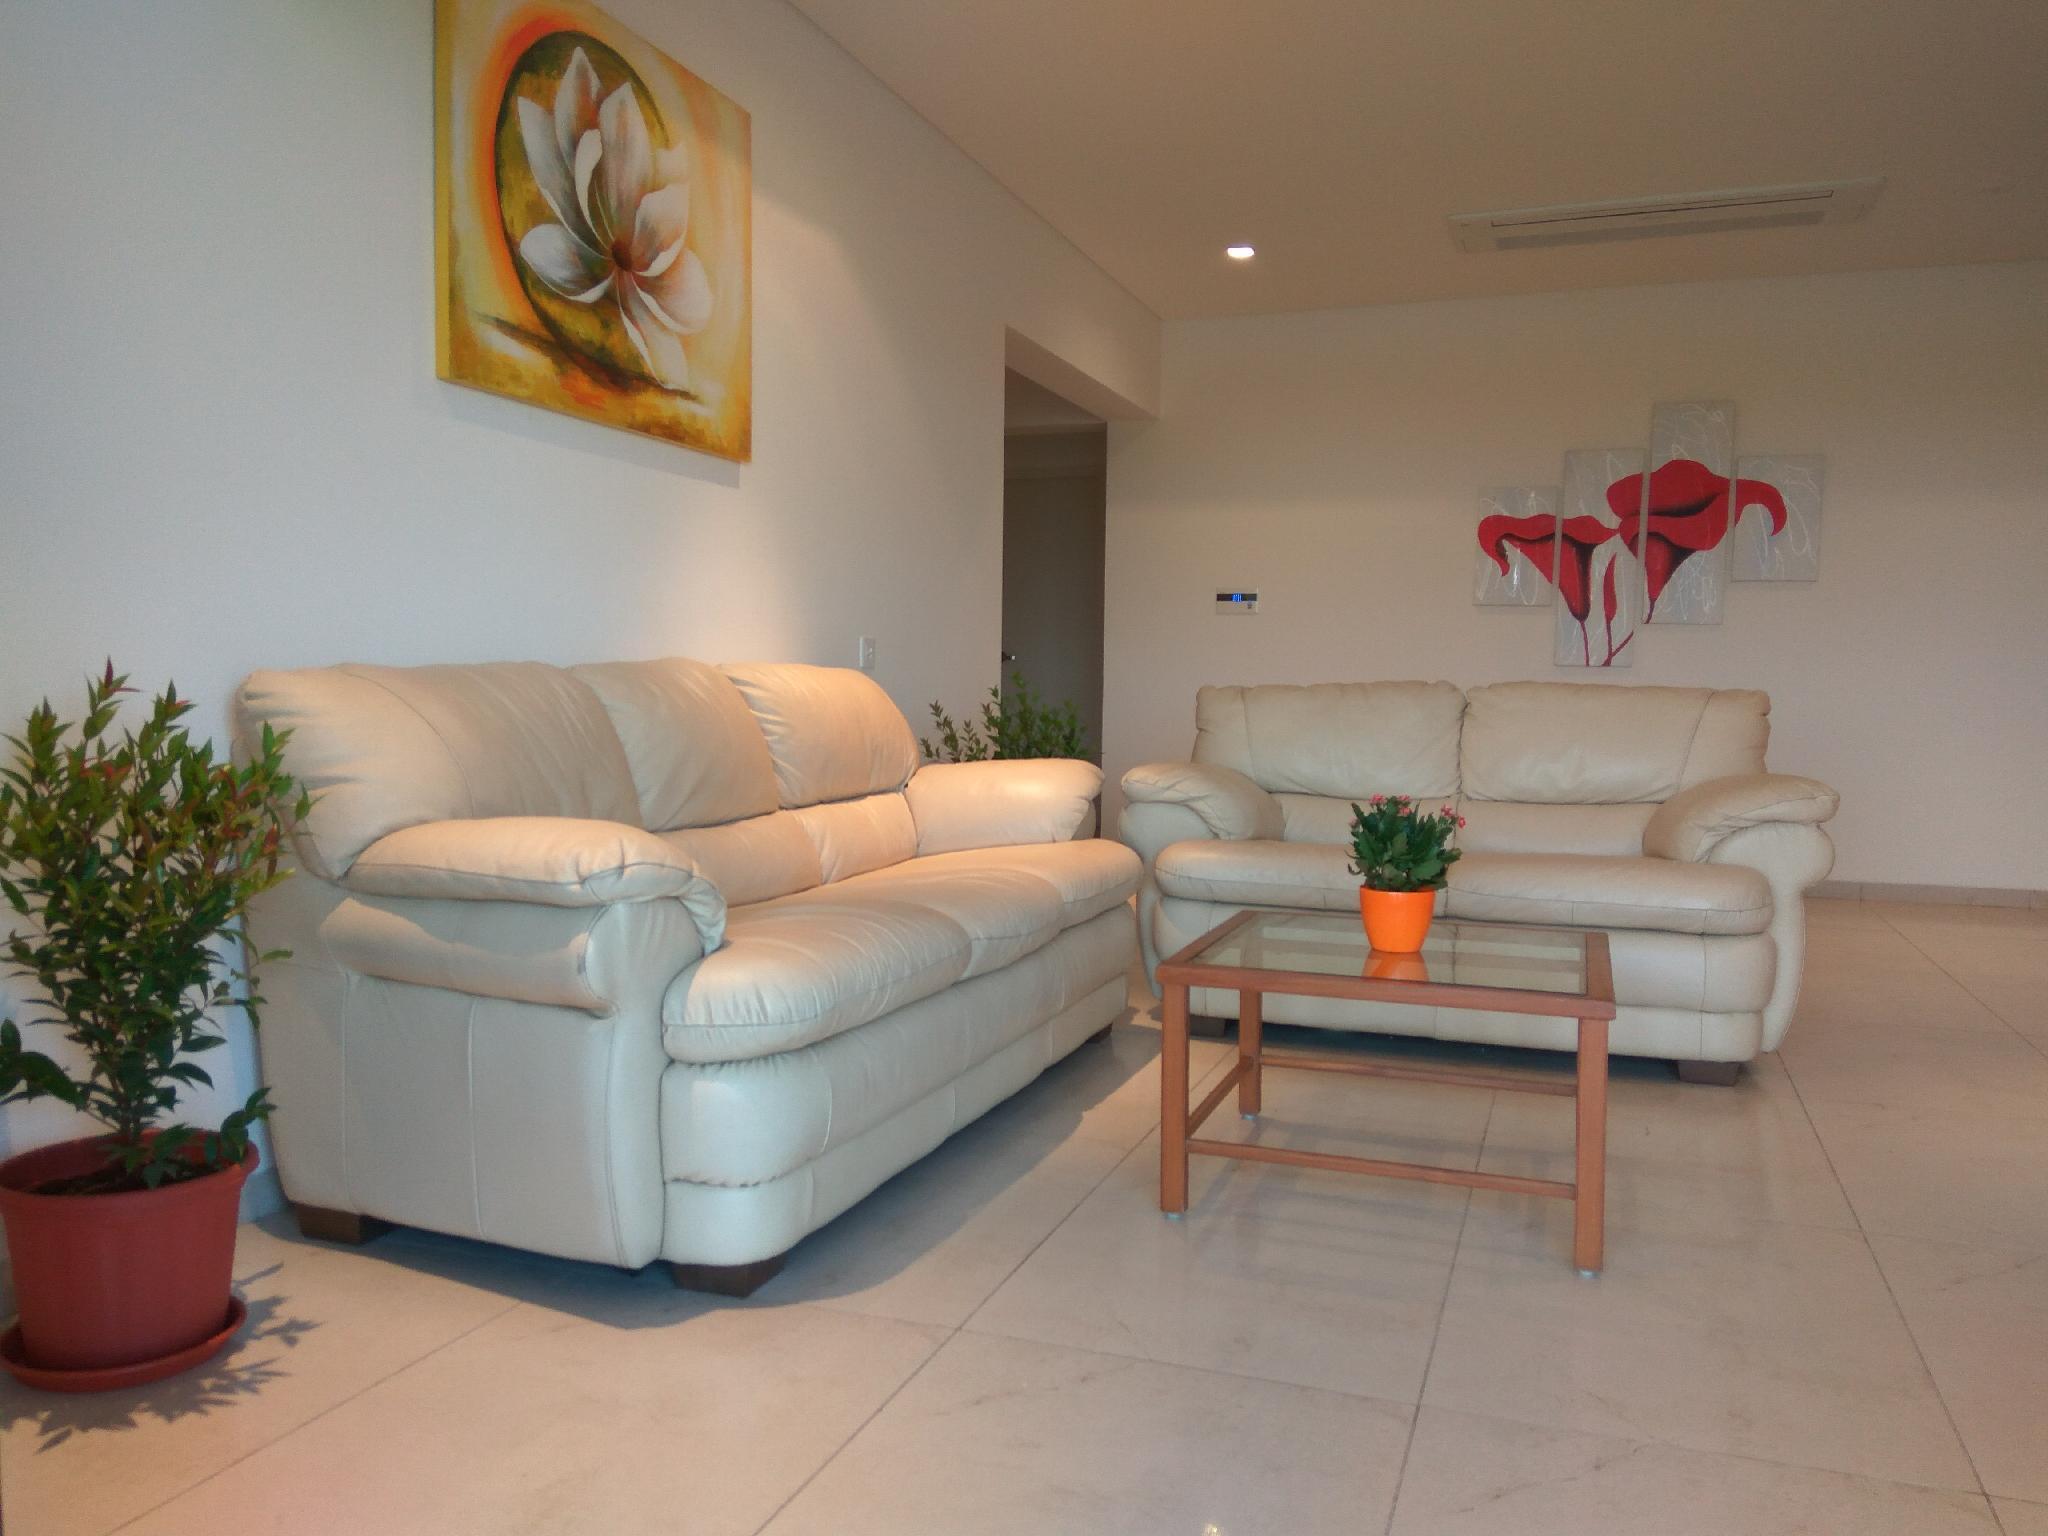 Advantage 2u Hospitality Management Pvt Ltd